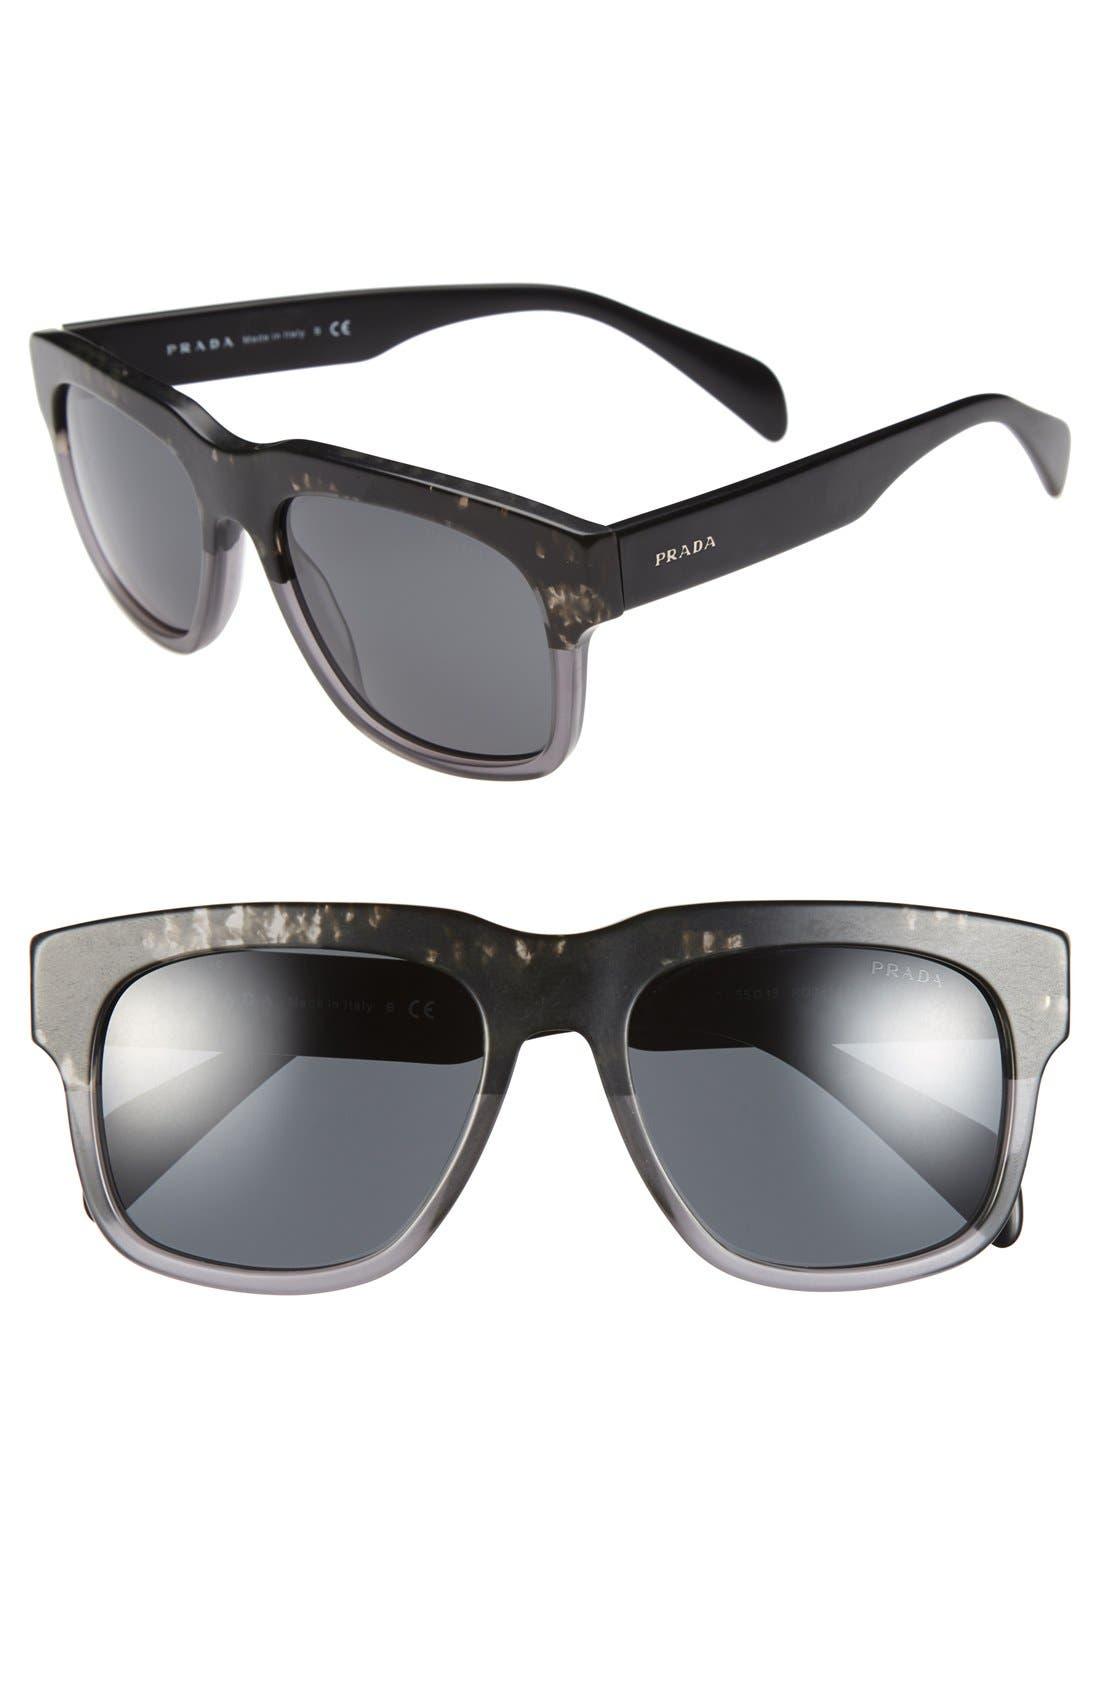 Main Image - Prada 55mm Sunglasses